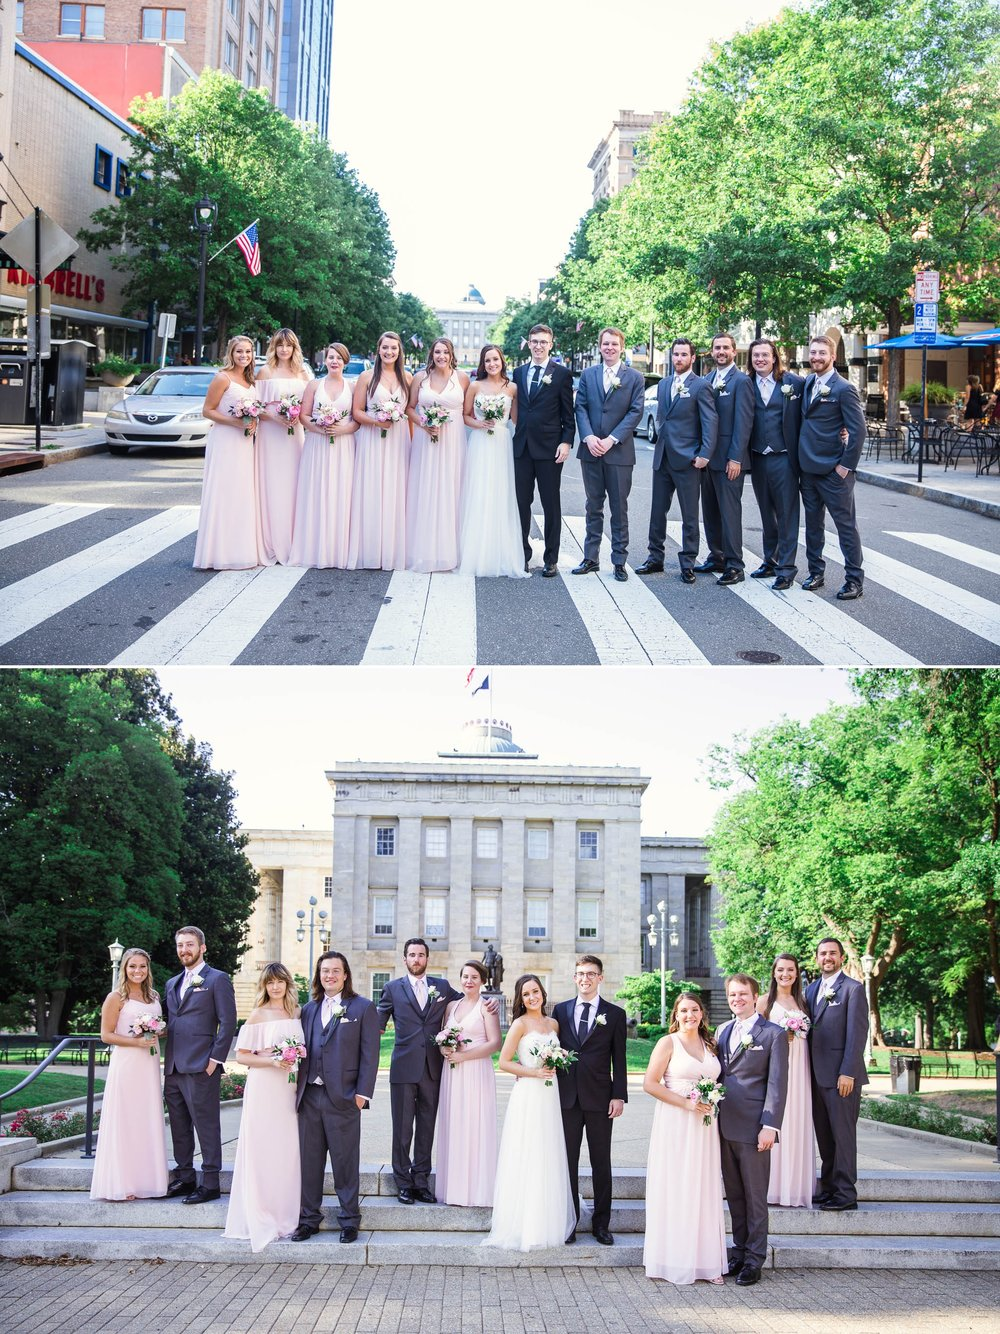 Elizabeth + Kane - Wedding at the Stockroom at 230 - Raleigh North Carolina Wedding Photographer 9.jpg